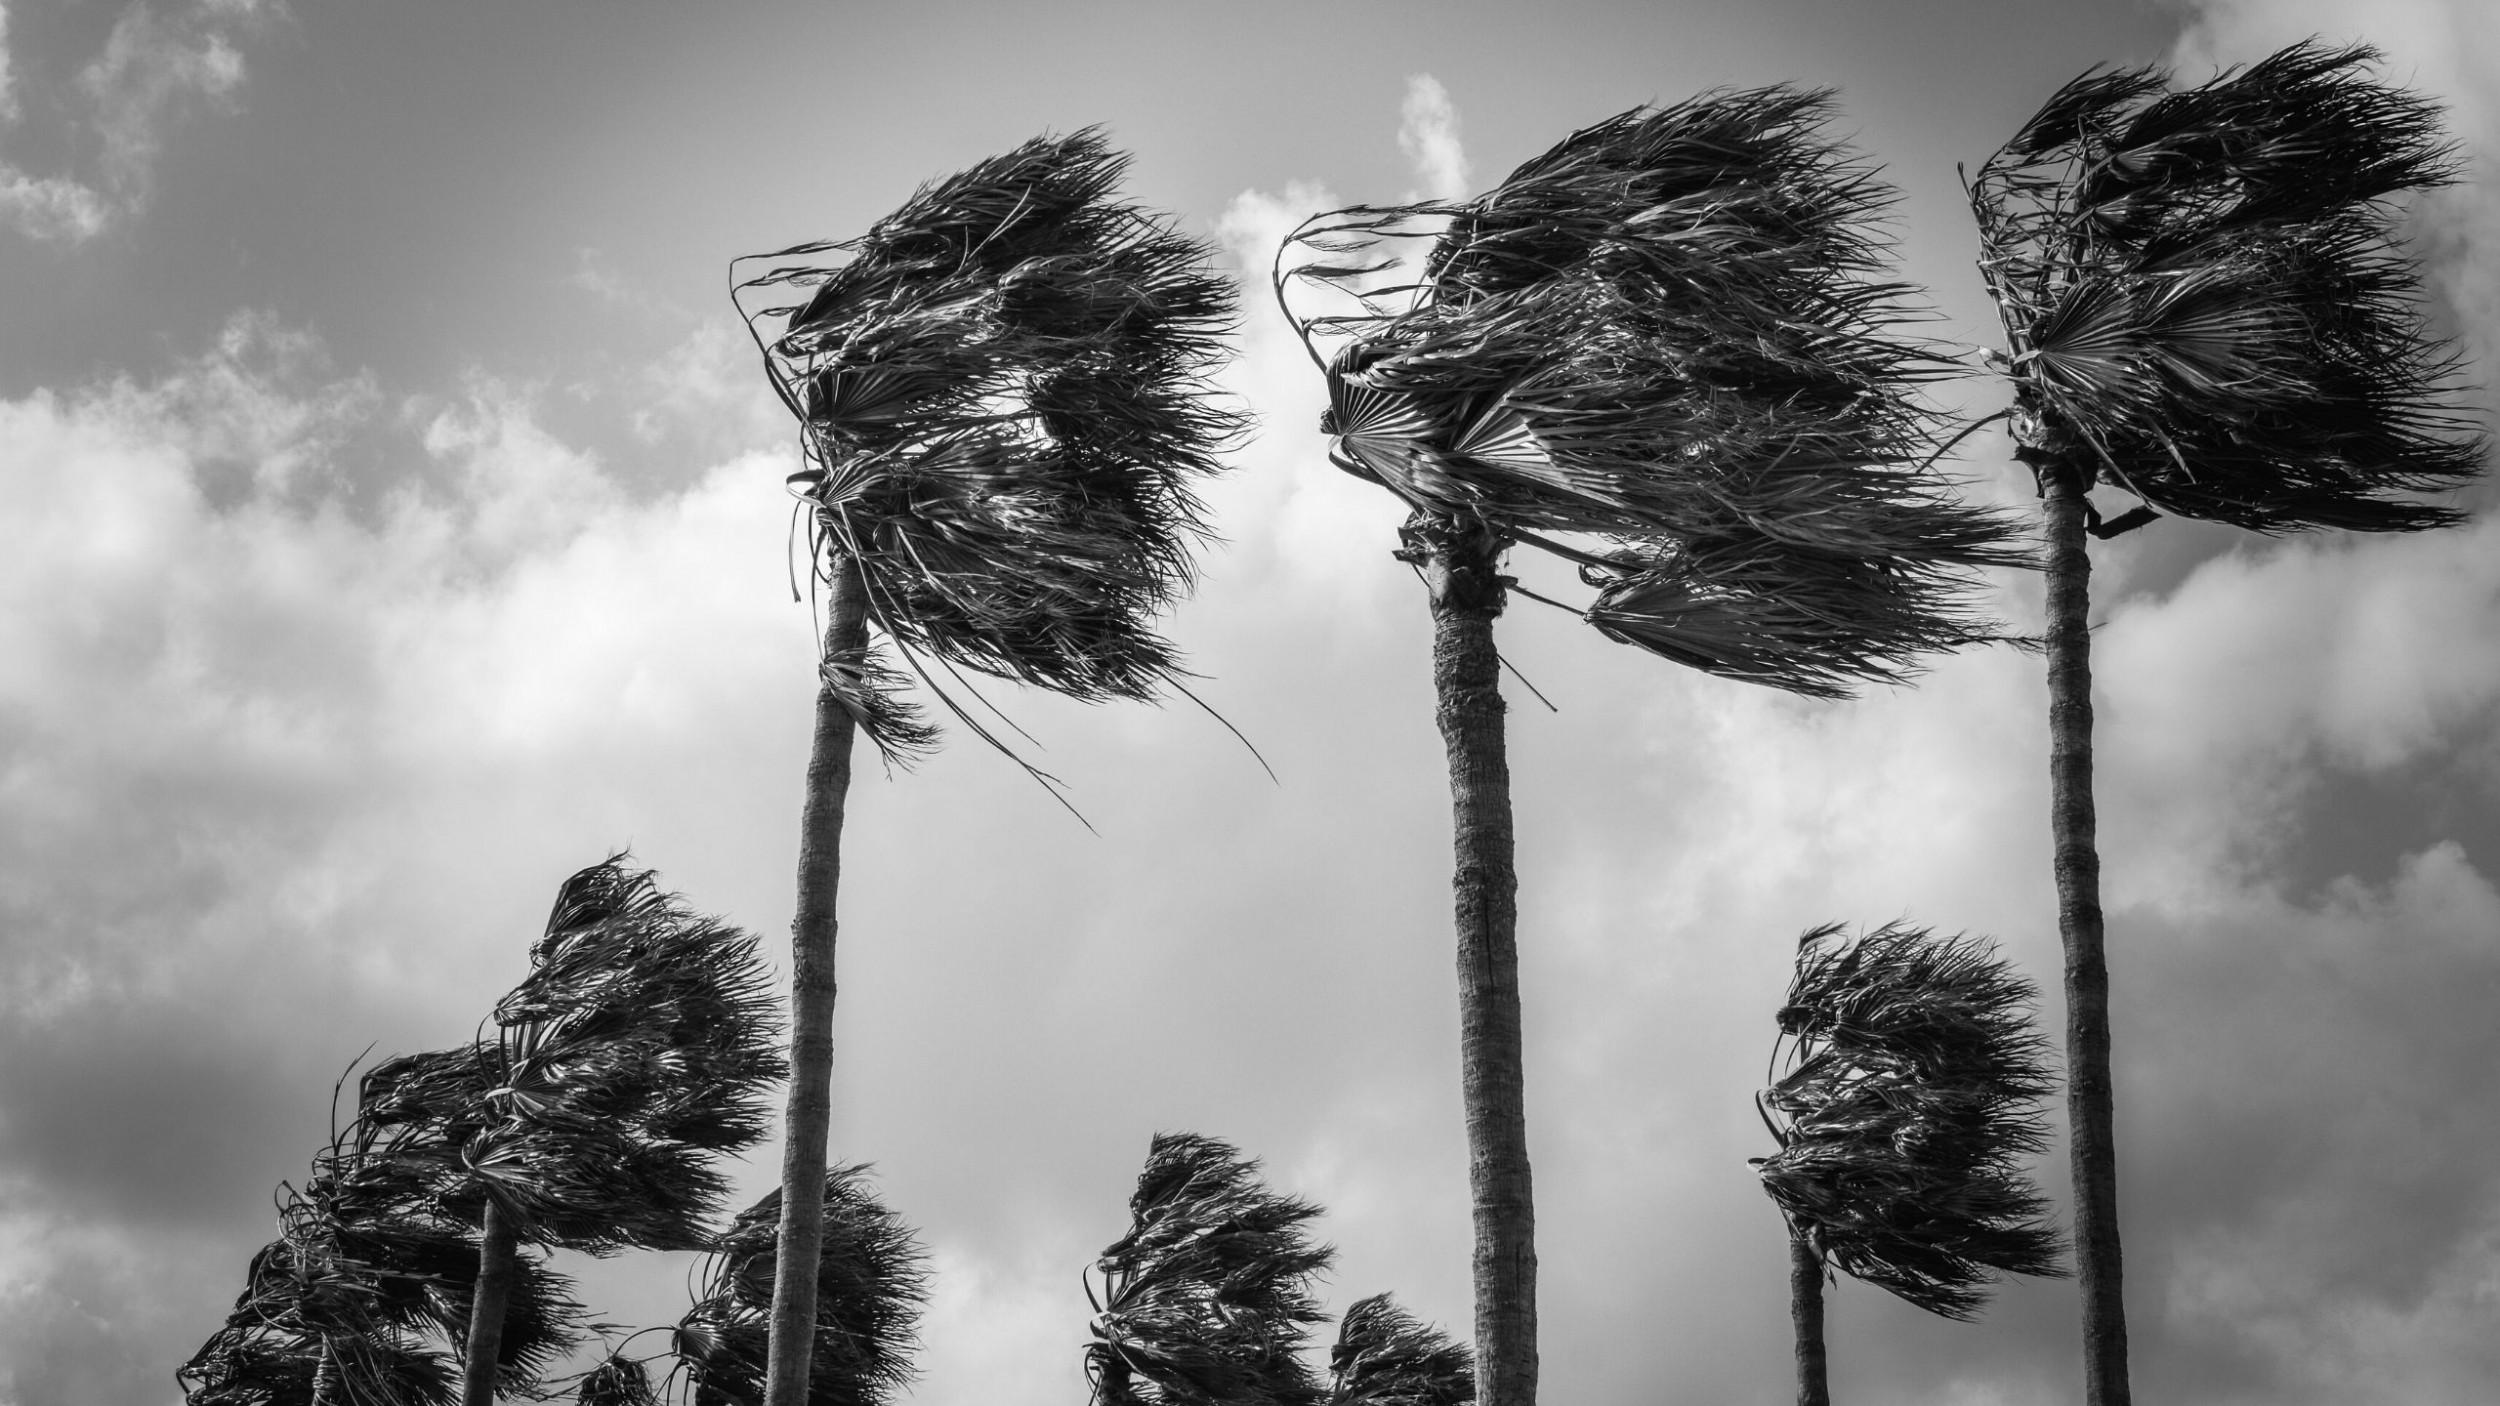 Newsweek AMPLIFY How to Prepare Hurricane Season